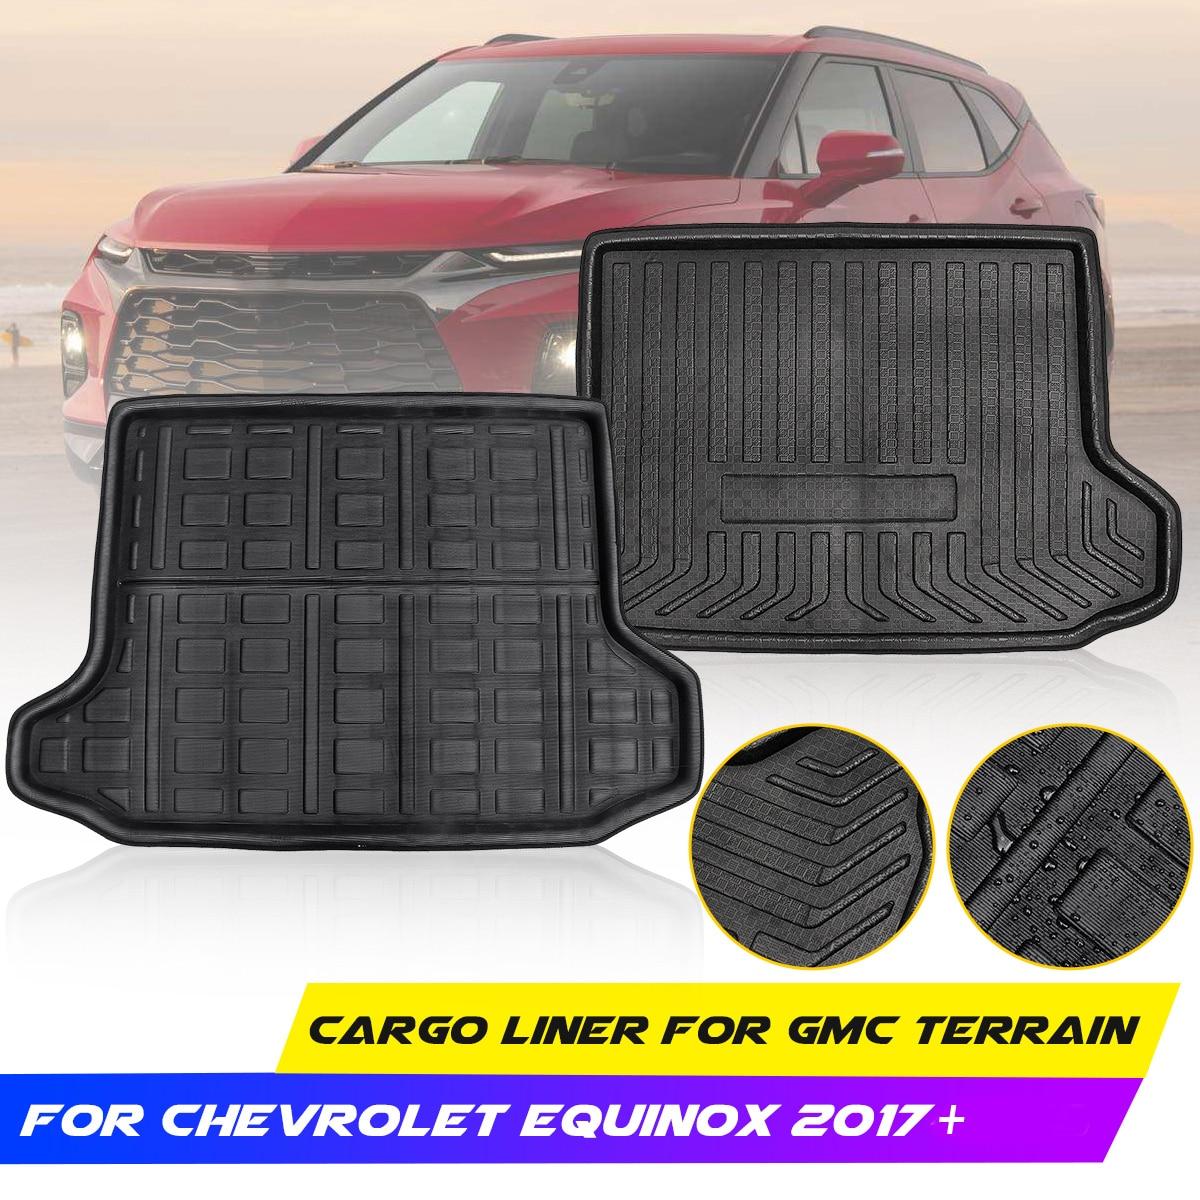 Forro de carga, bandeja trasera, impermeable, alfombra para maletero, alfombra para suelo, bota a medida para terreno GMC para Chevrolet Equinox 2017 2018 2019 +